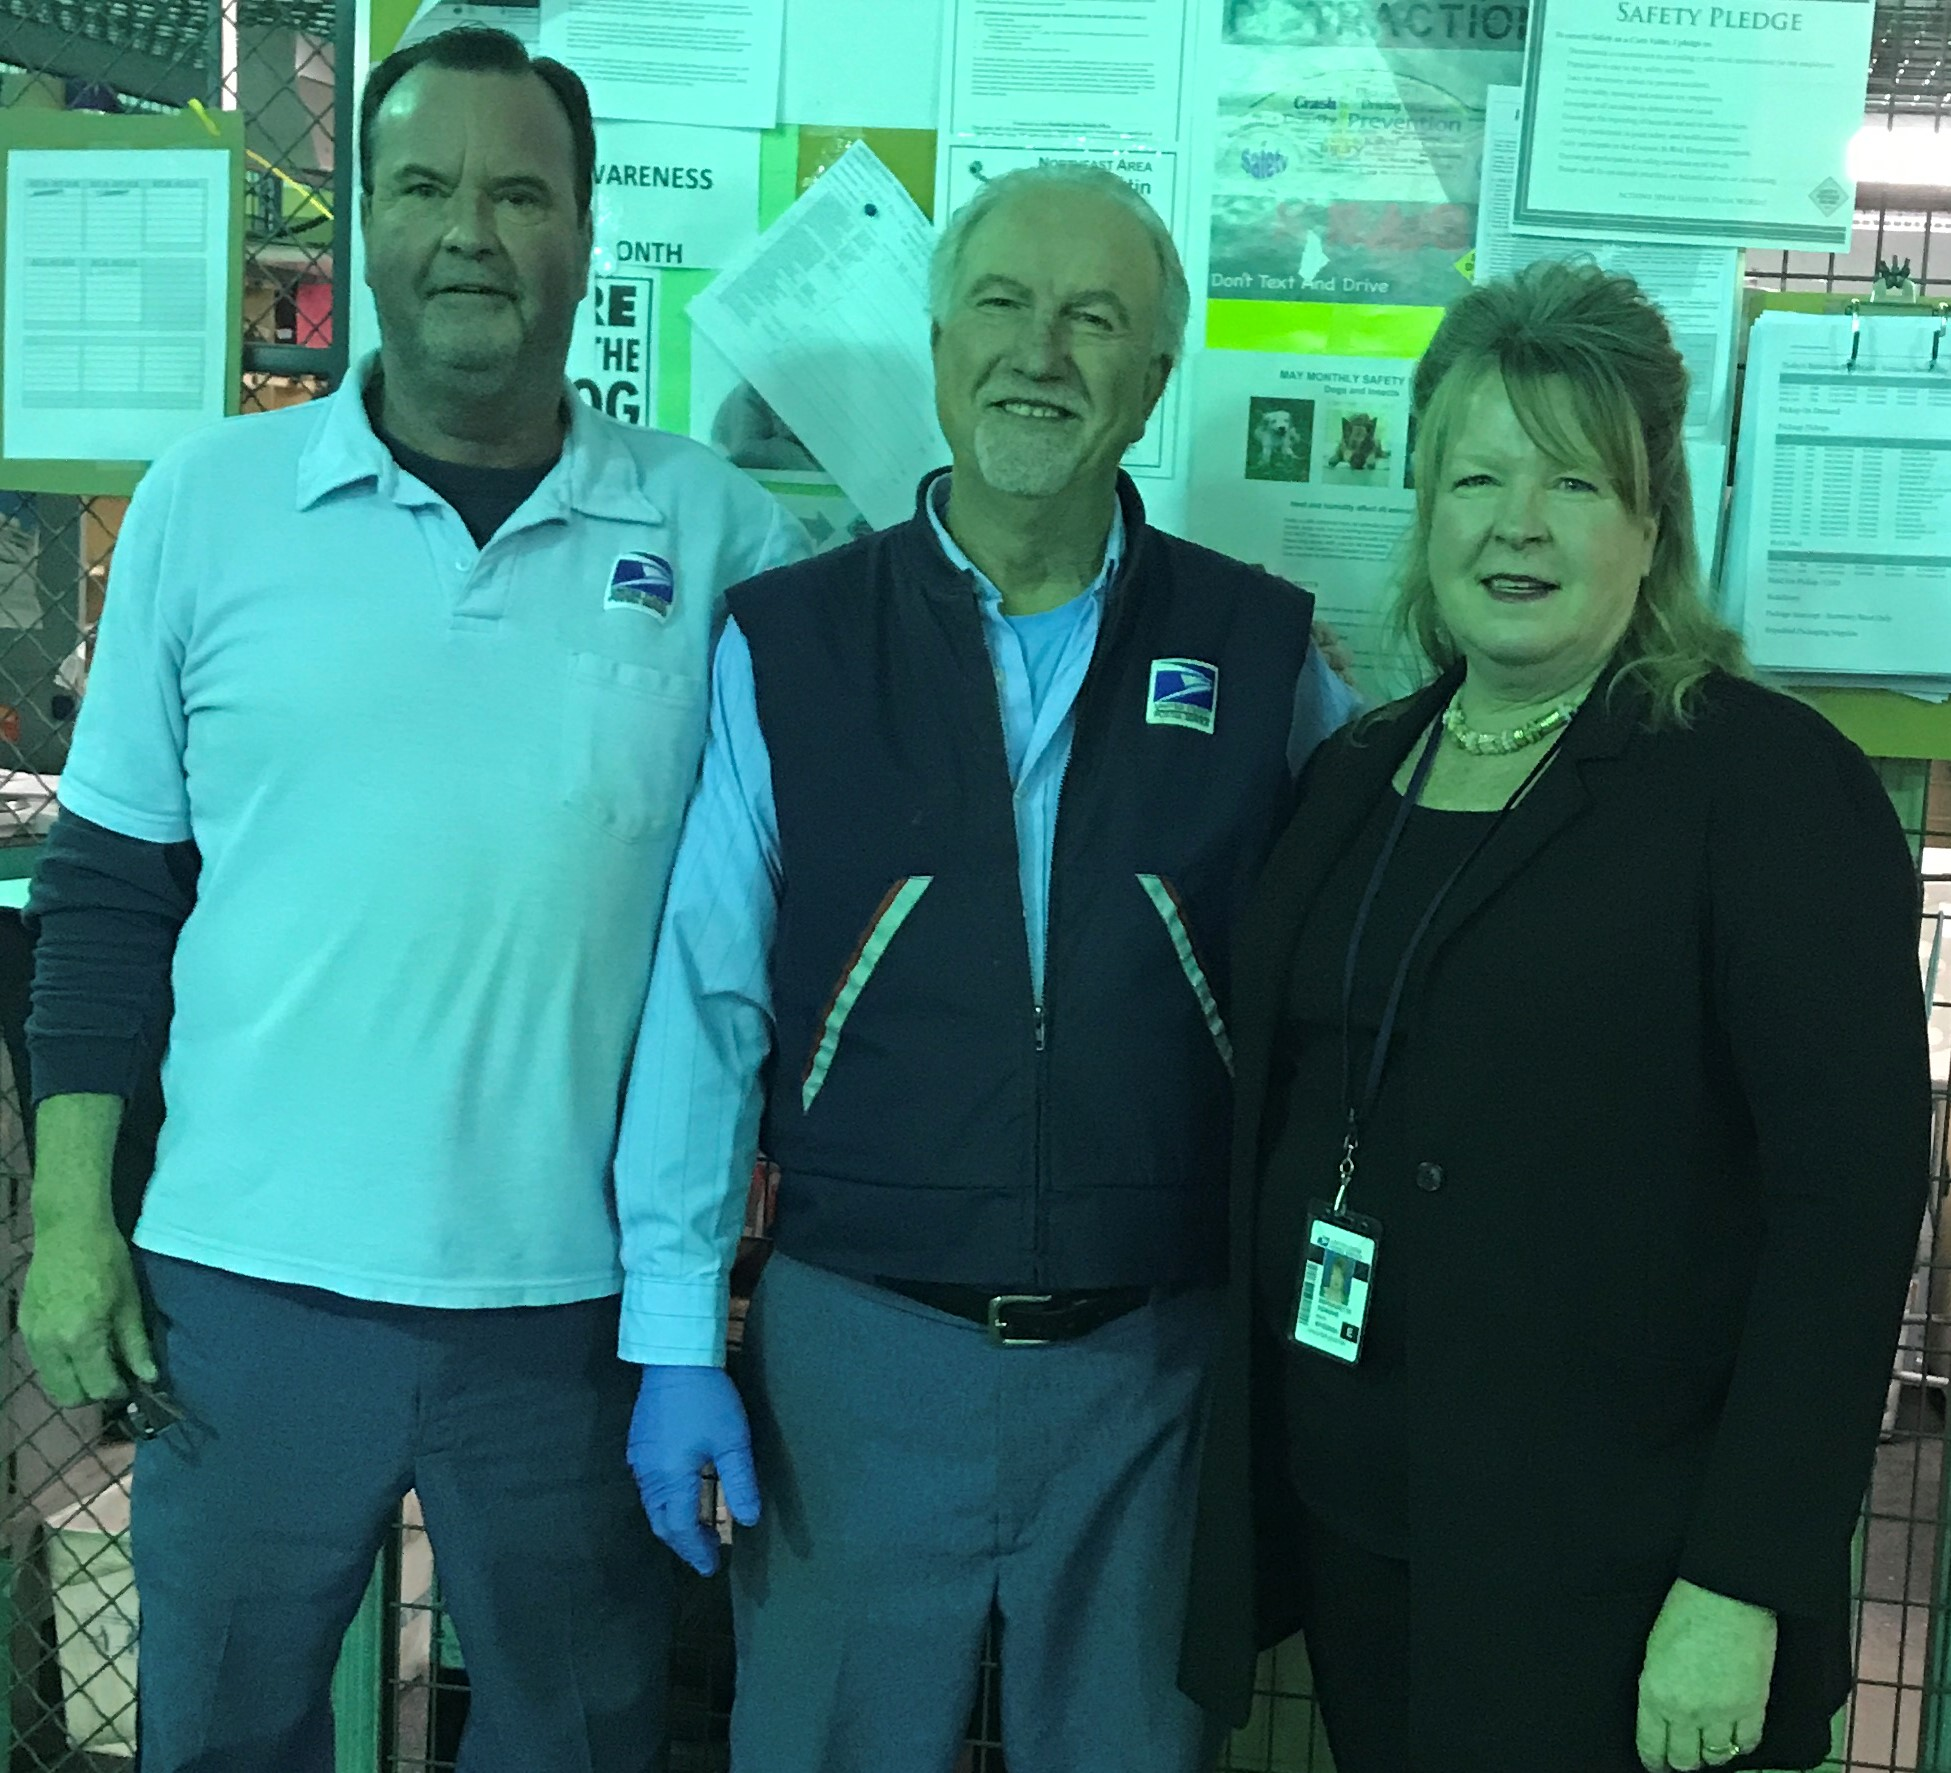 Shop-Steward-Brian-Senior-and-VP-Bernadette-Romans-with-Retiree-Charlie-Hamos